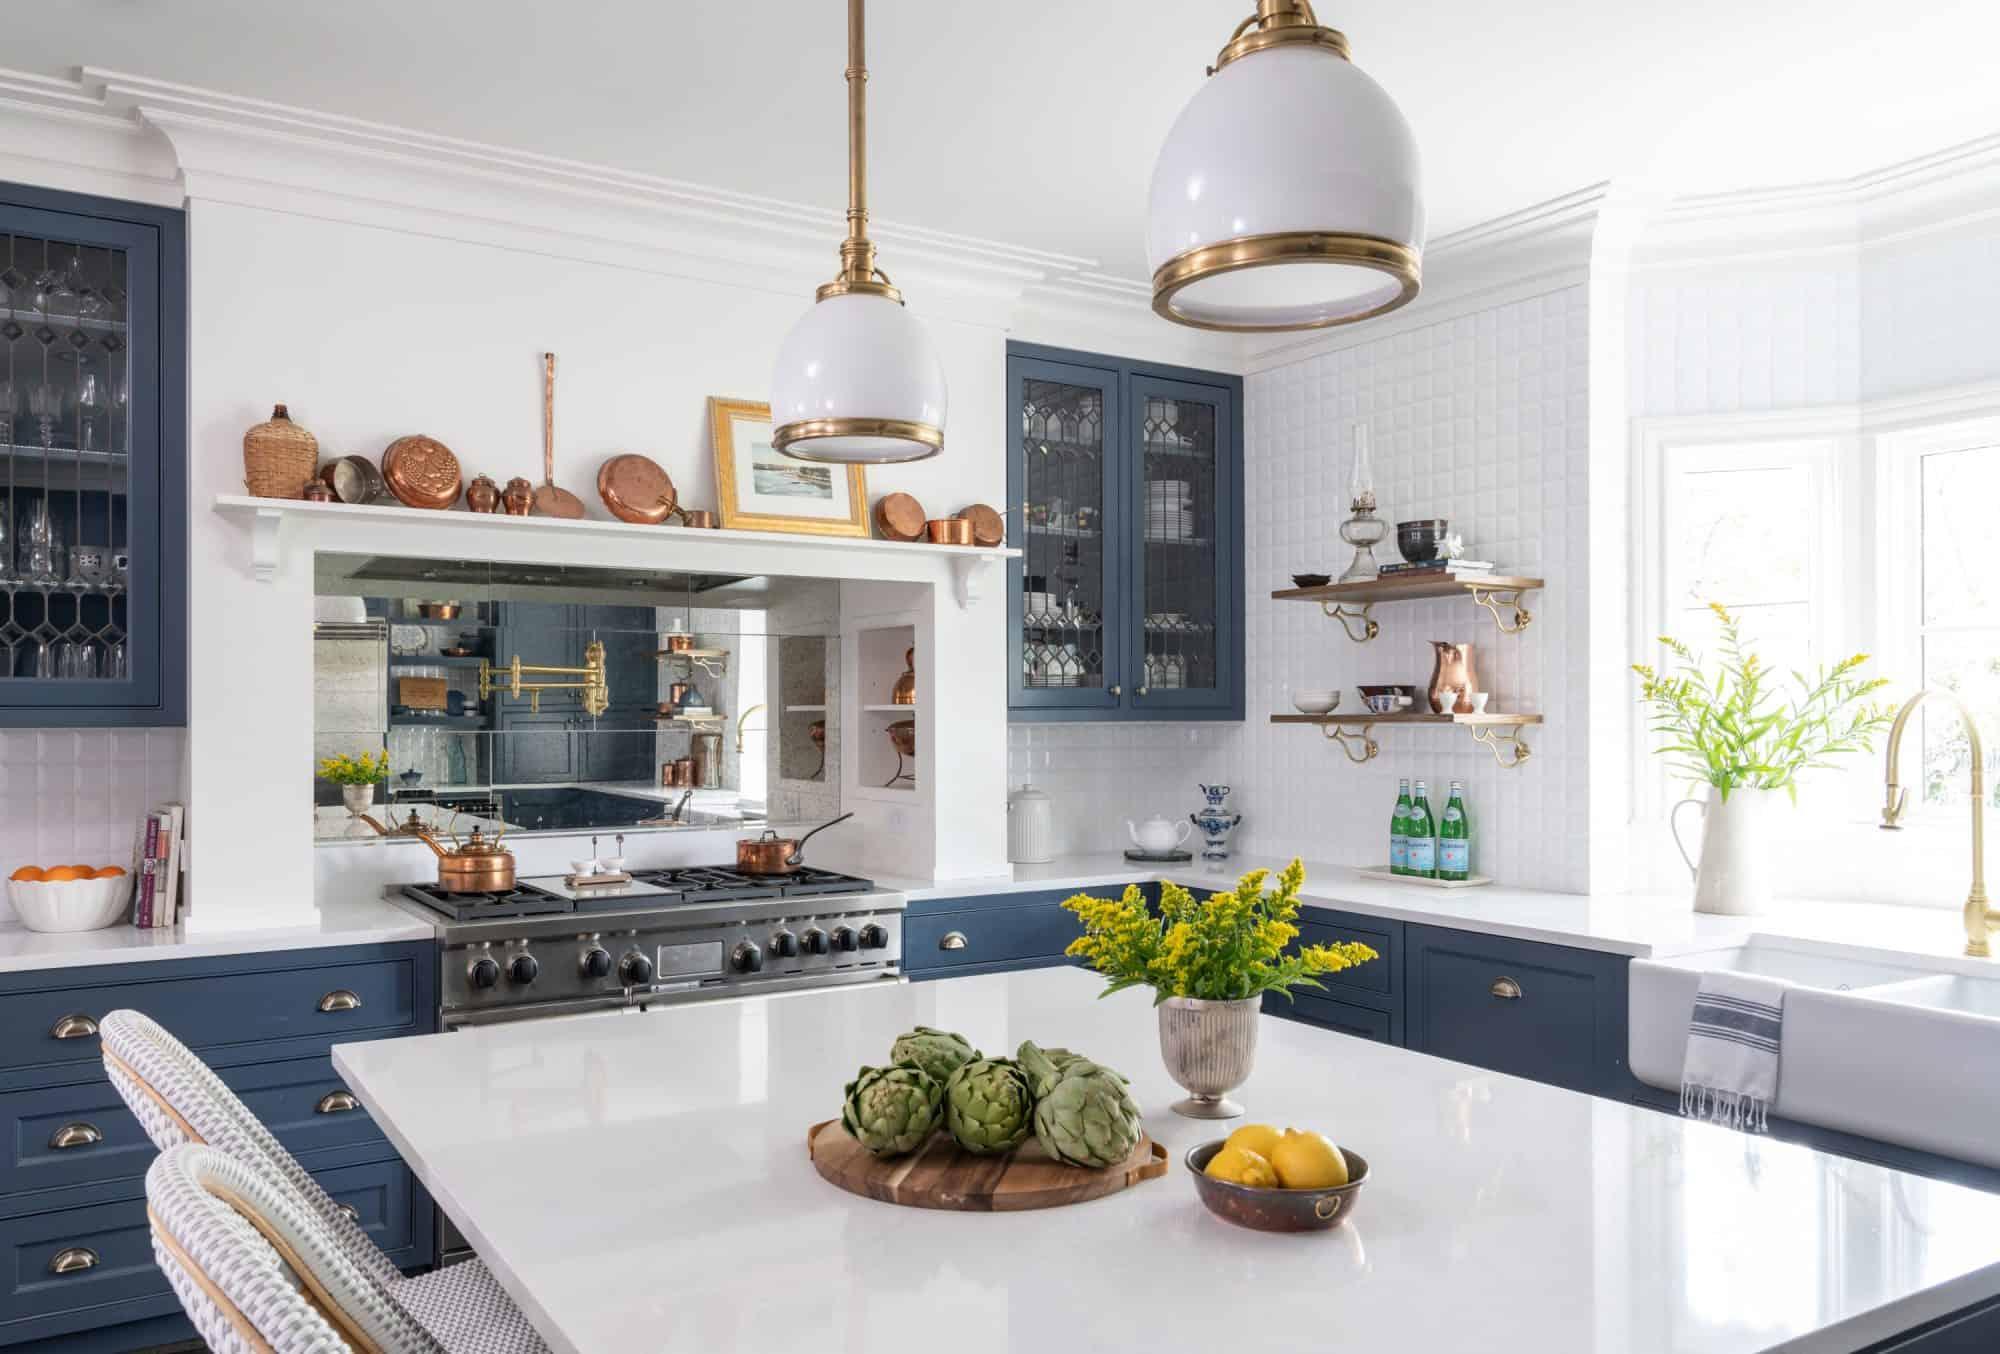 kitchen design kitchen design Kitchen Design: How to Improve Your Kitchen kitchen design 3